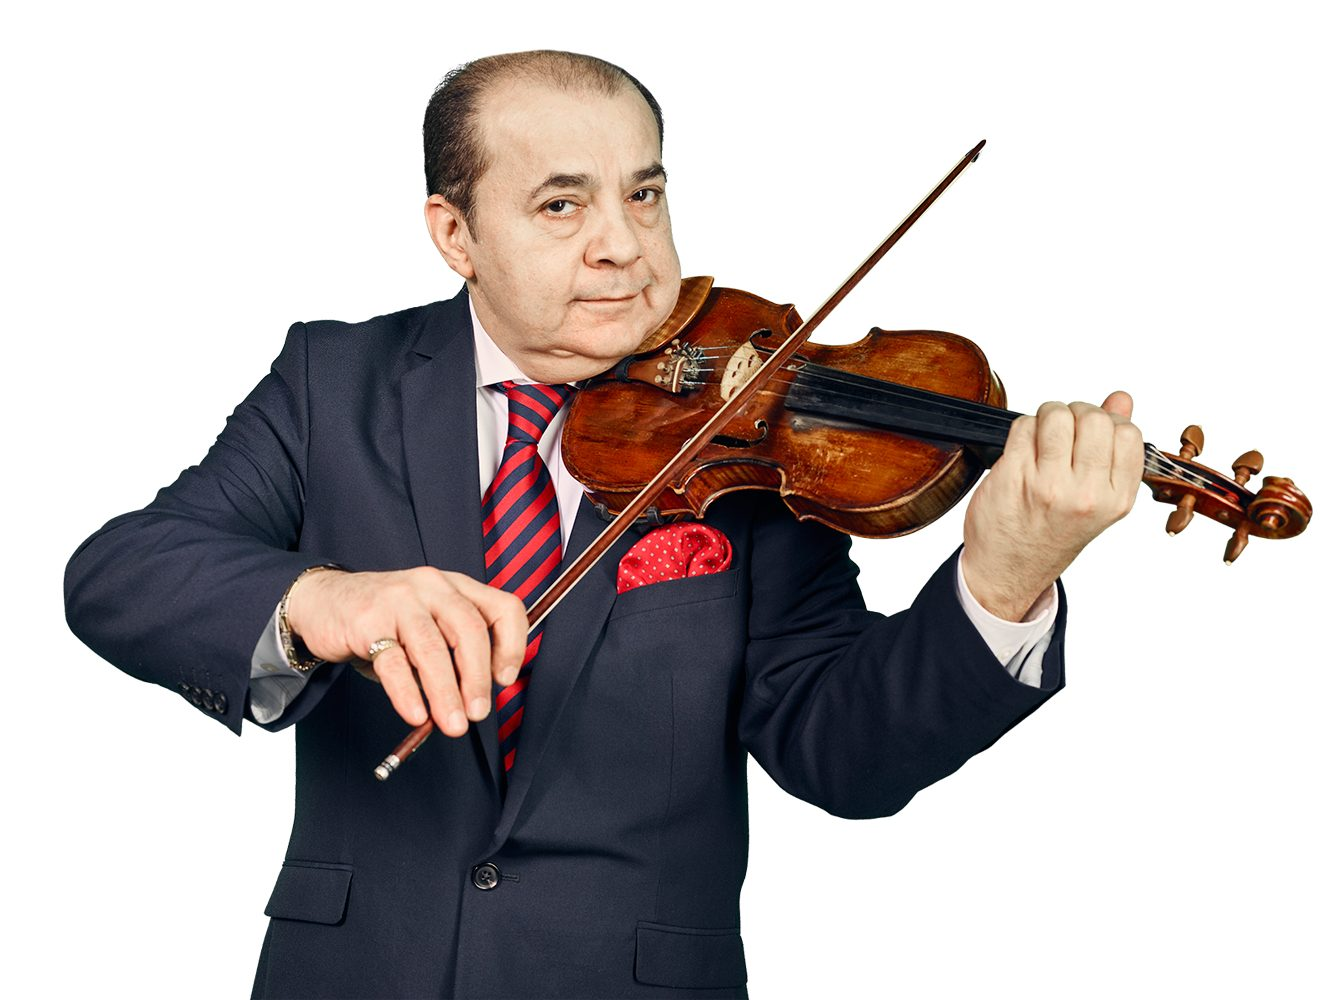 29 februari 2020 – Miklós Lakatos – Zigeunermuziek uit Boedapest